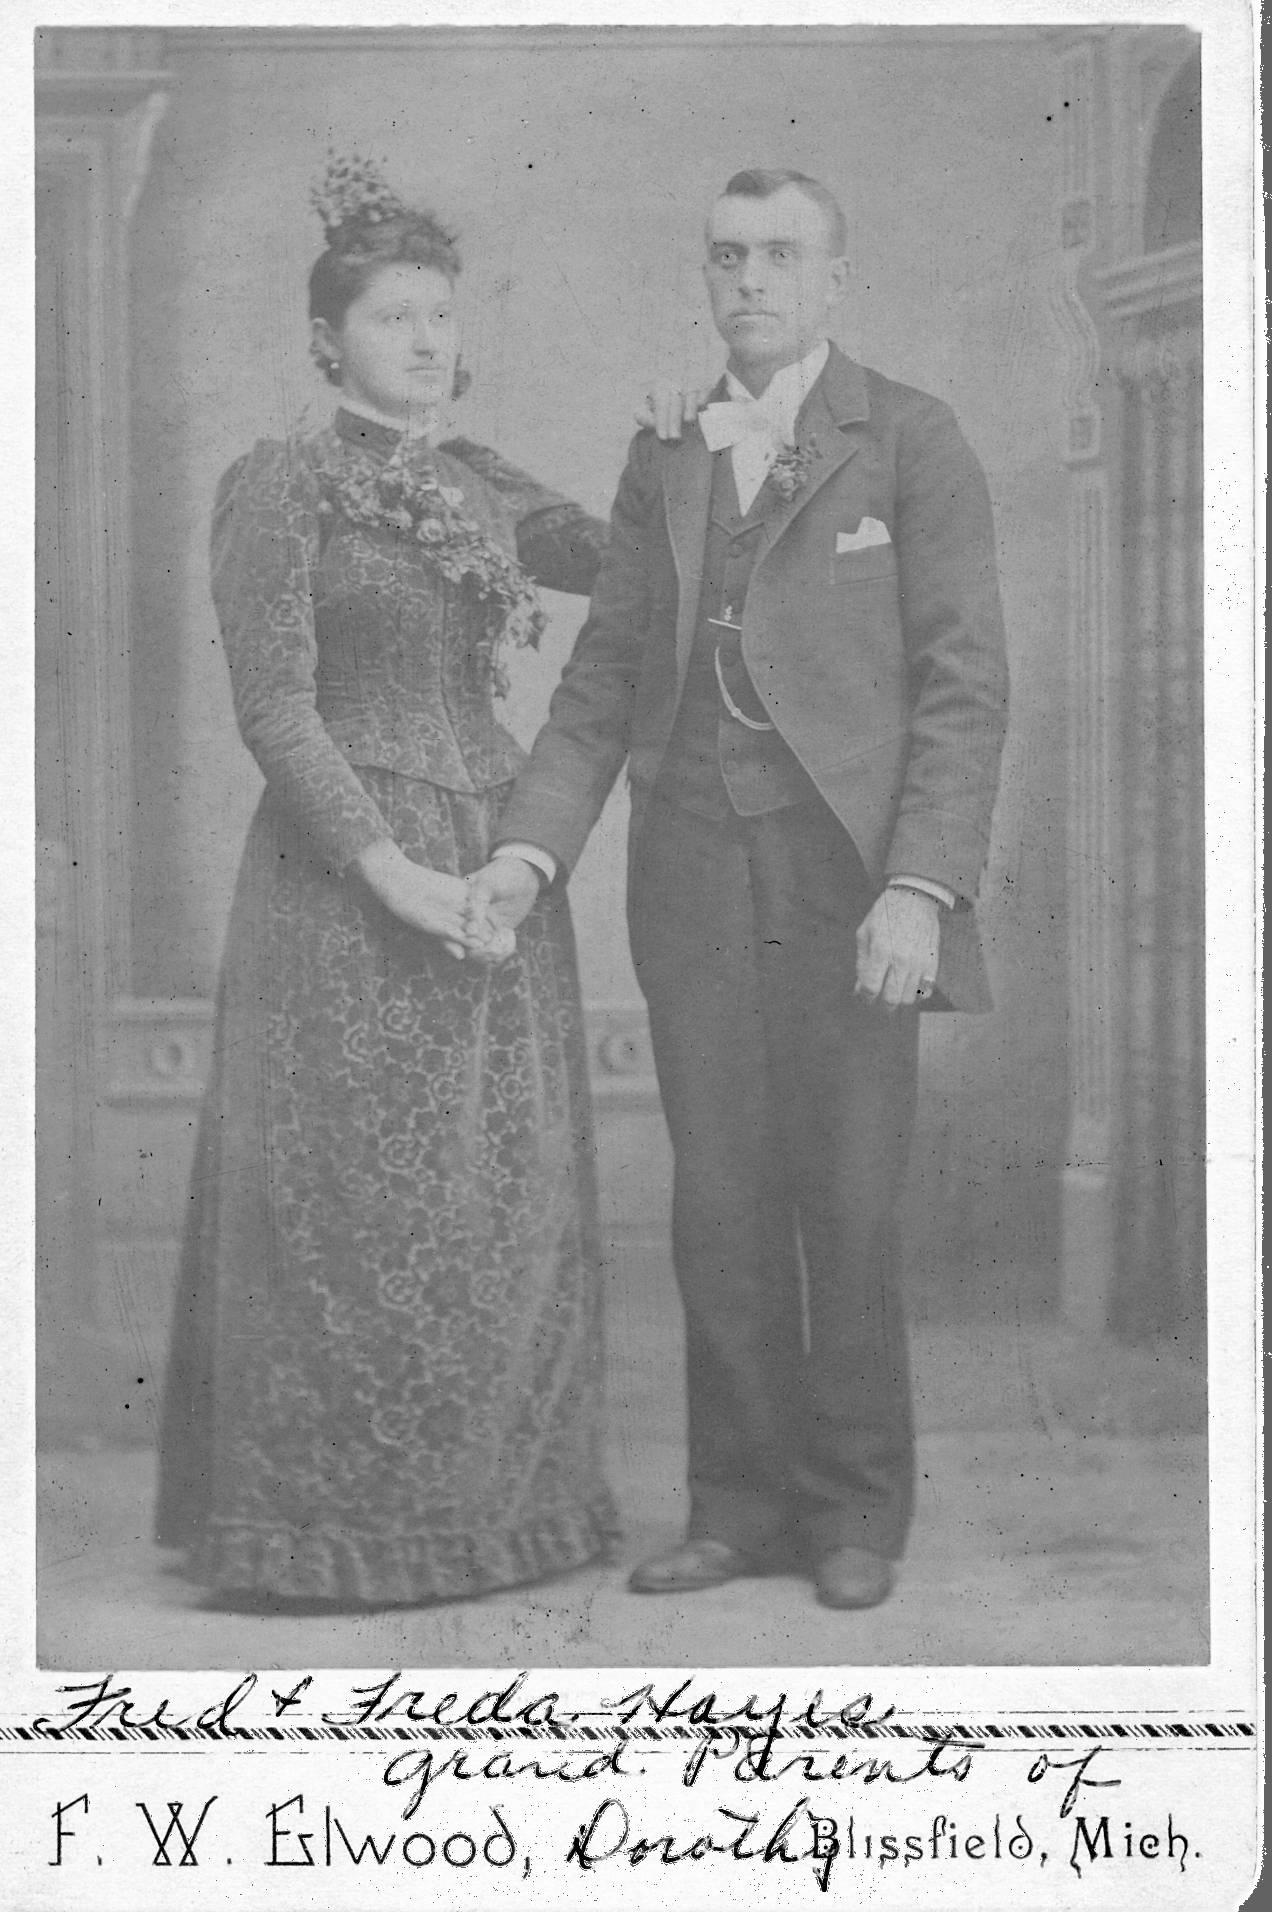 F. W. Elwood of Blissfield, MI 1892